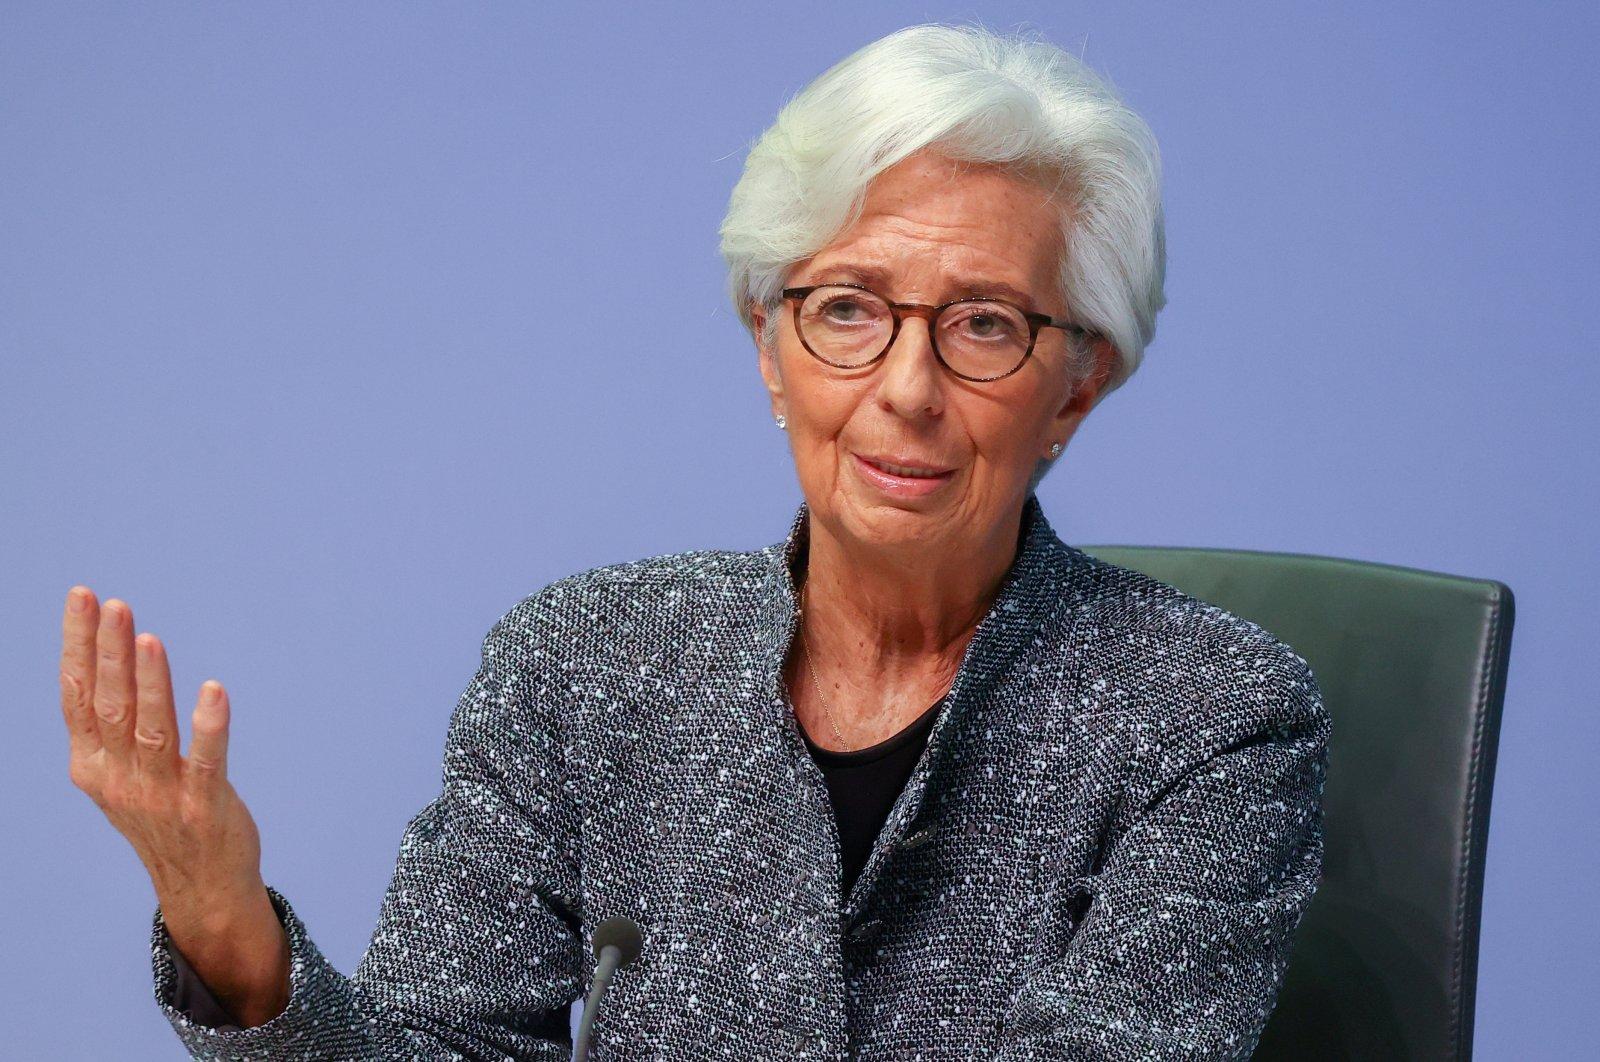 European Central Bank (ECB) President Christine Lagarde speaks in Frankfurt, Germany, March 12, 2020. (Reuters Photo)